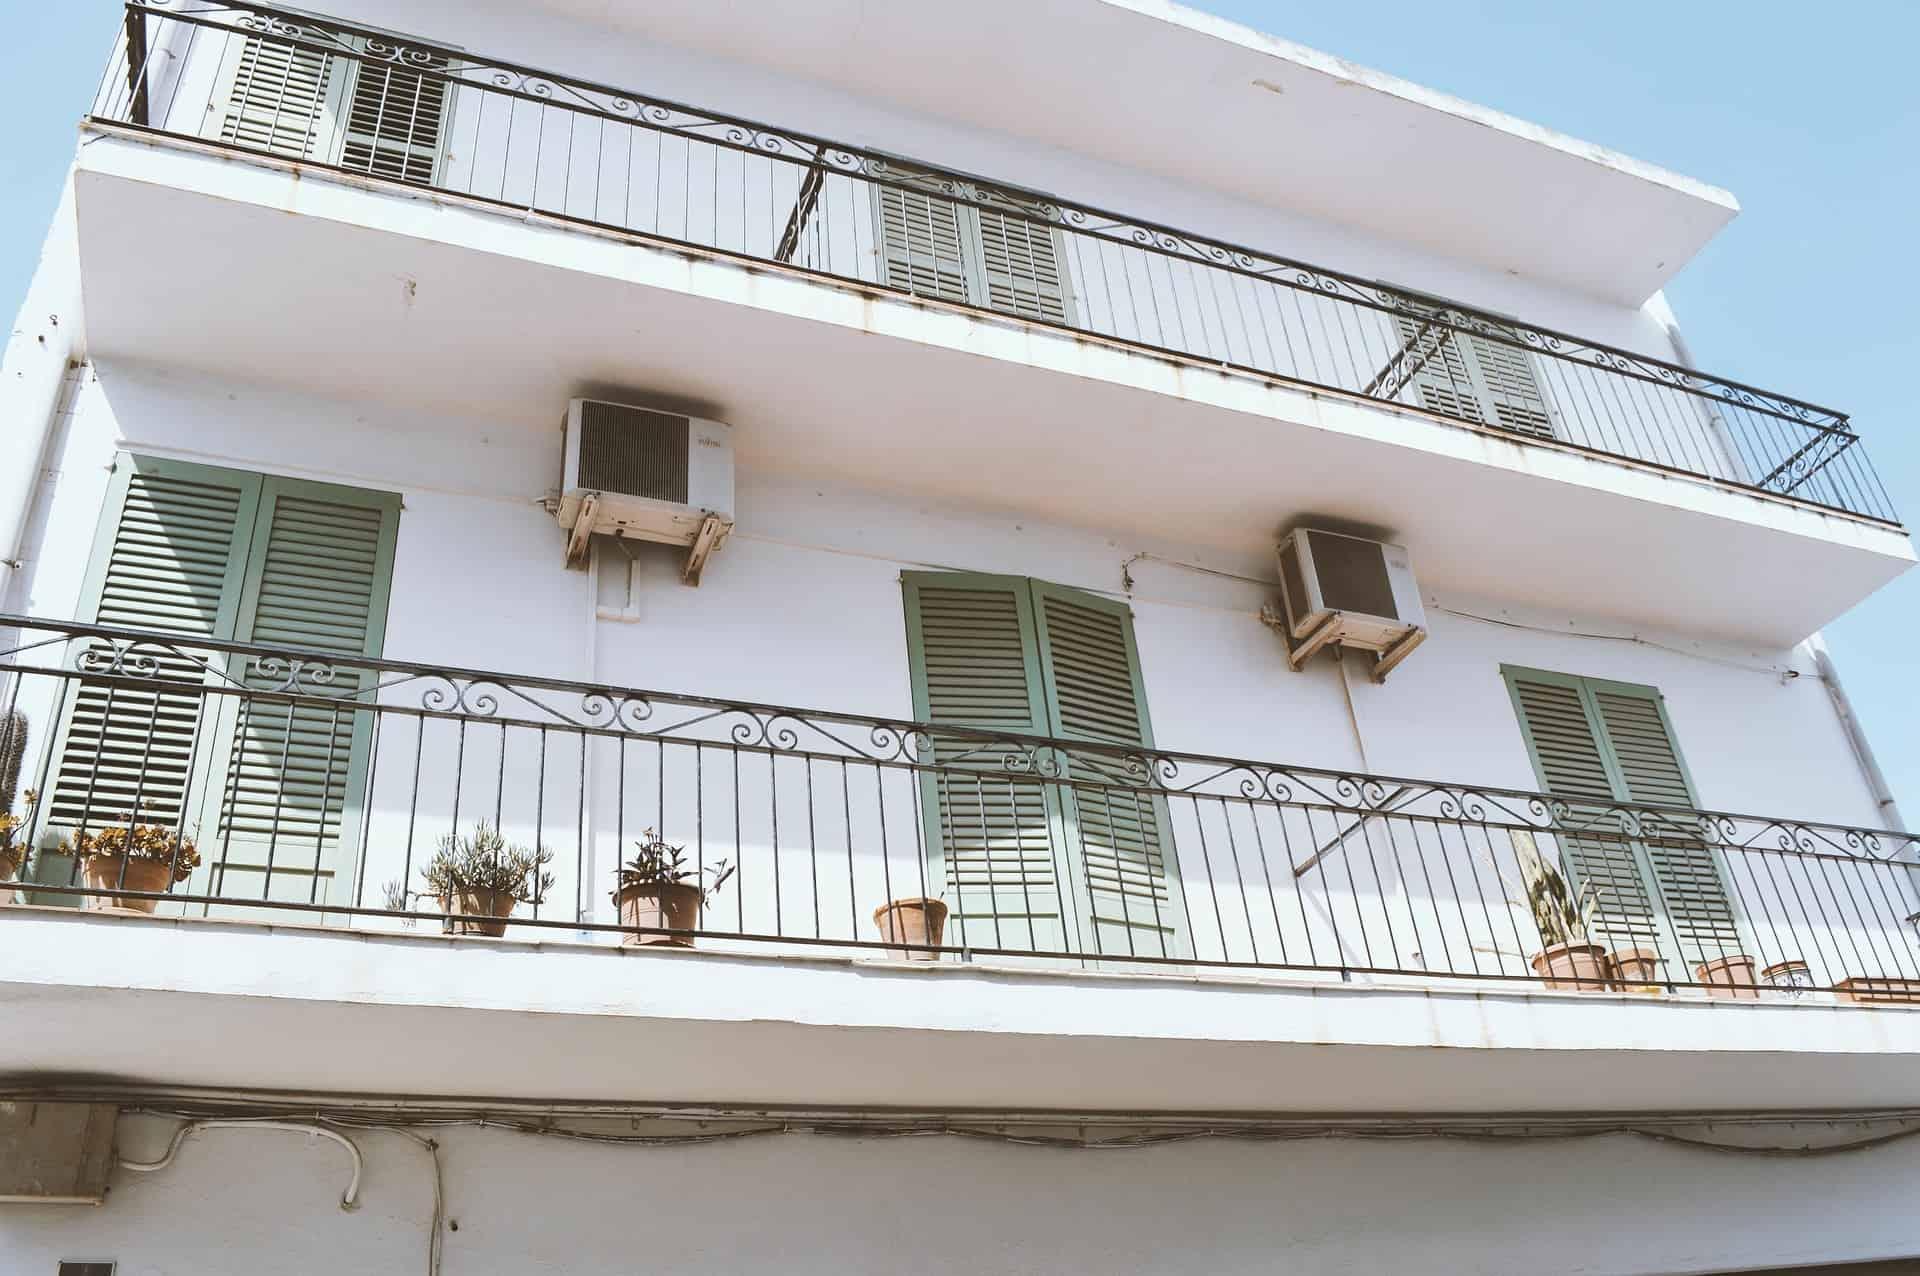 climatisation exterieure cache climatisation air3d. Black Bedroom Furniture Sets. Home Design Ideas